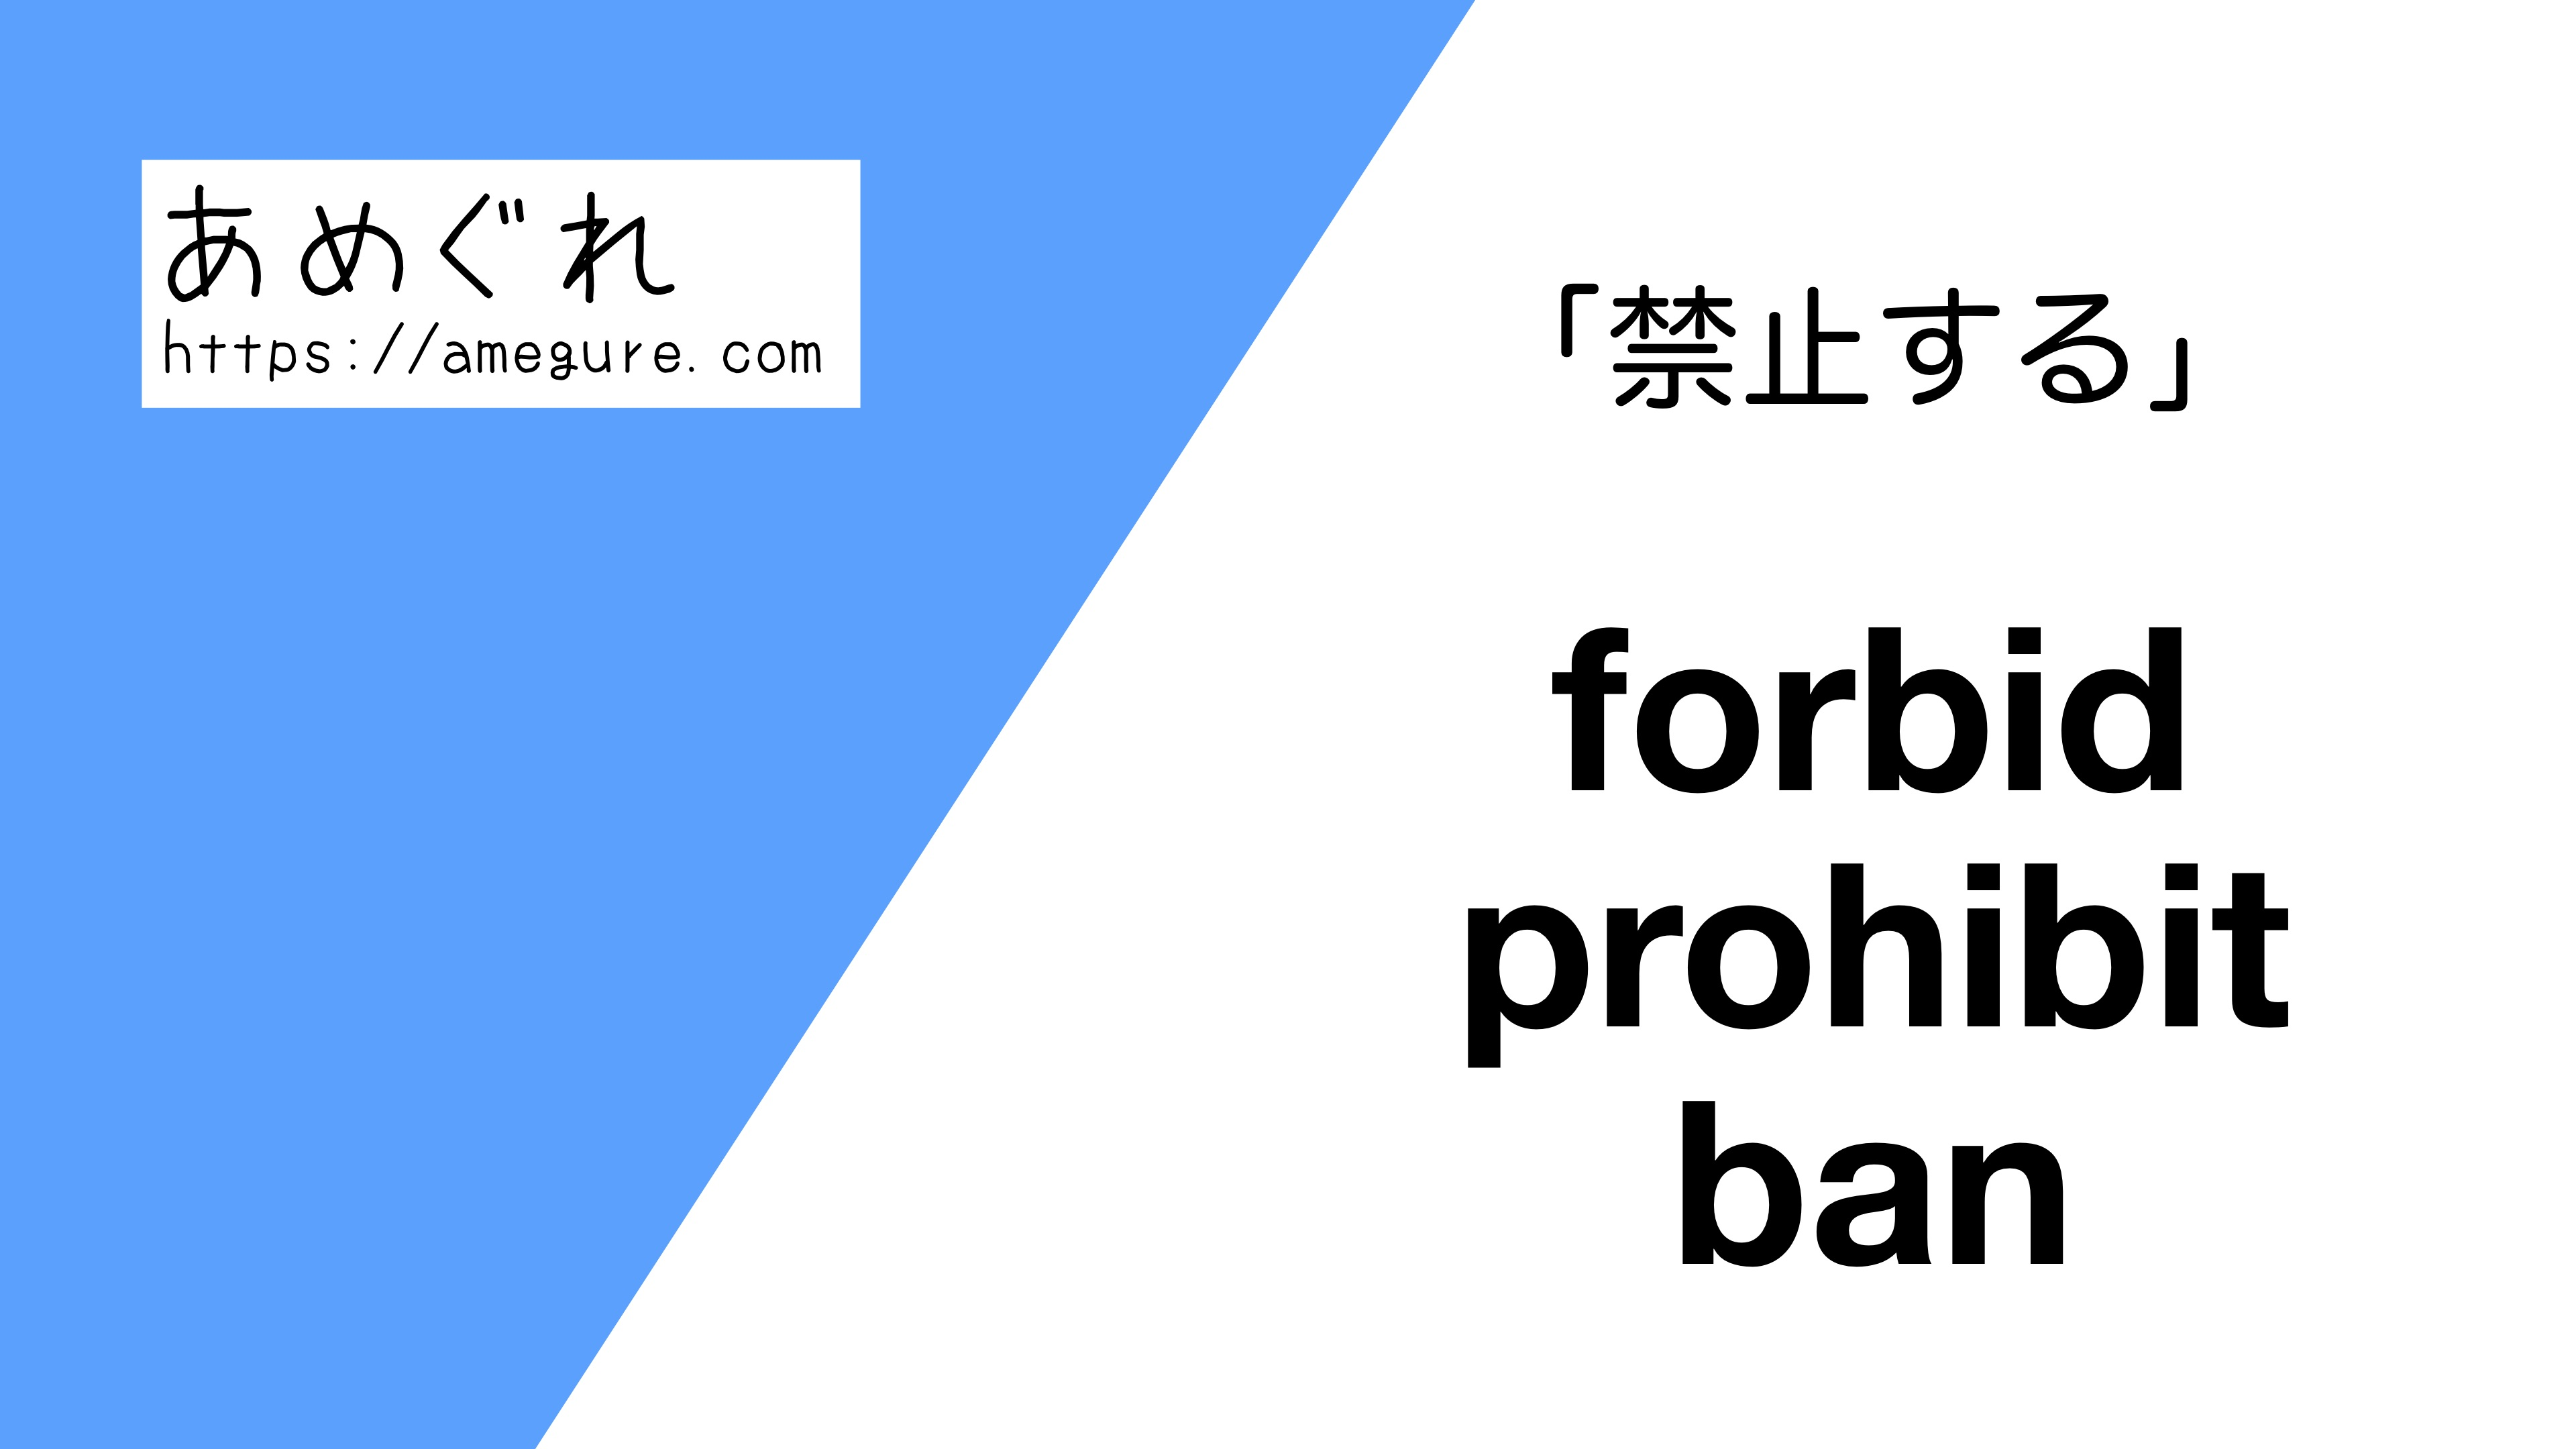 forbid-prohibit-ban違い